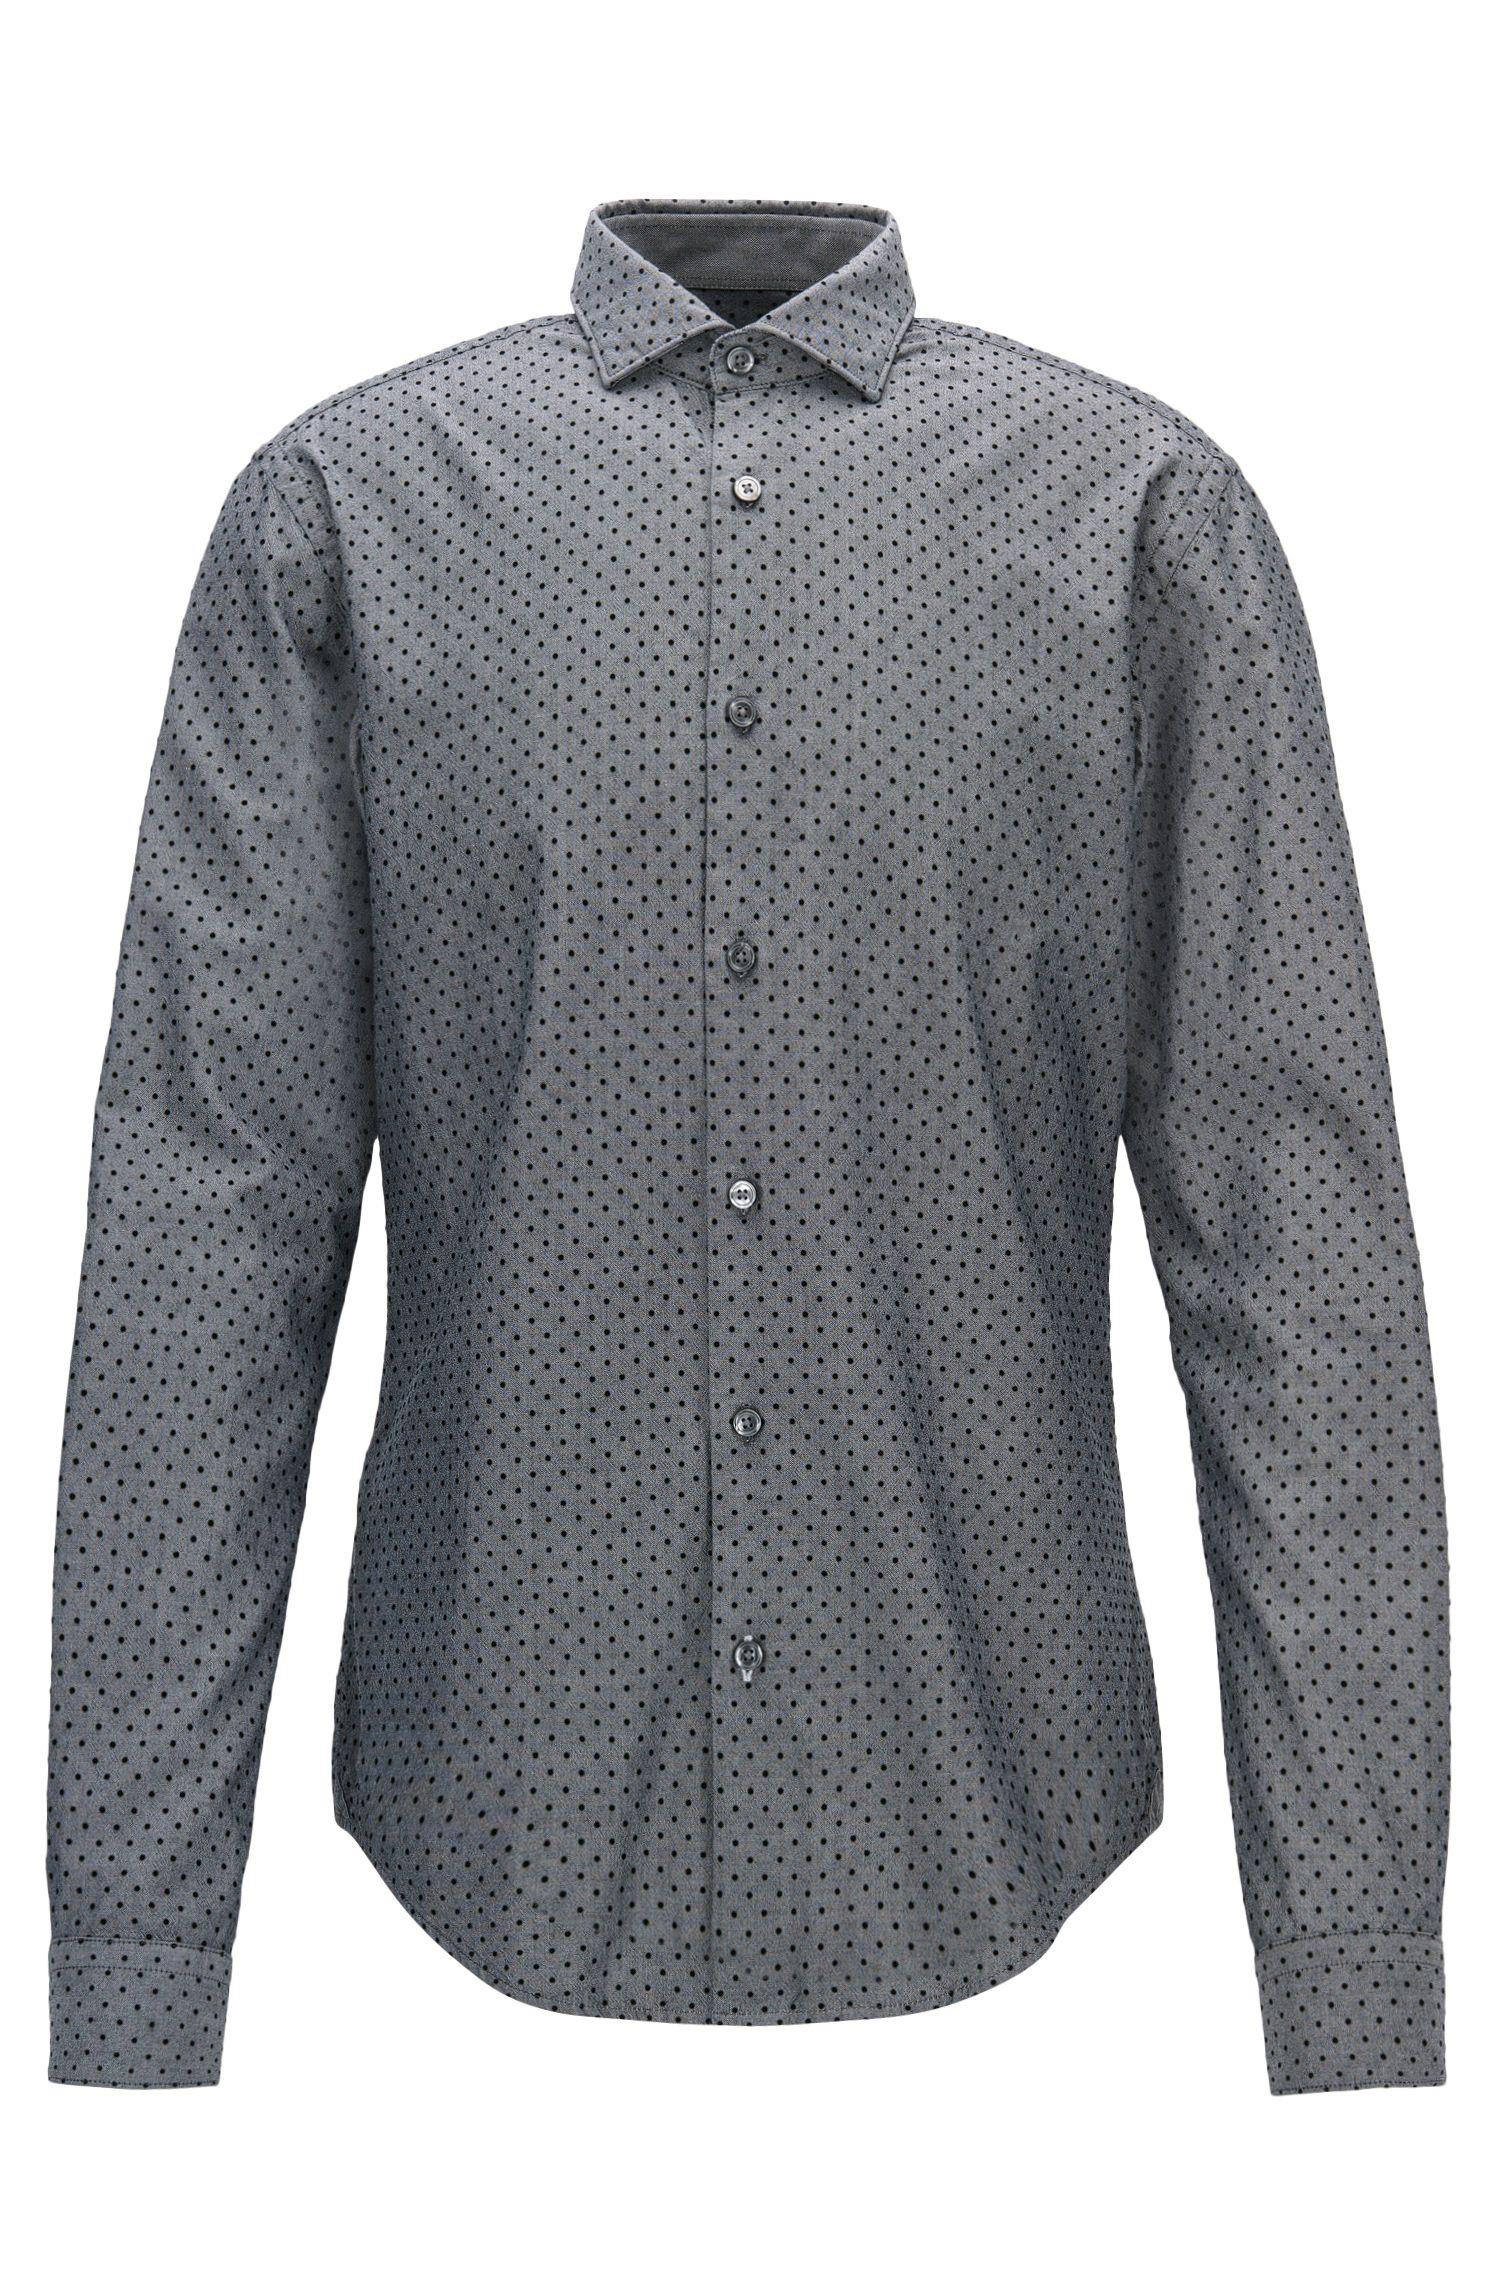 Polka Dot Sport Shirt, Slim Fit | Ridley F